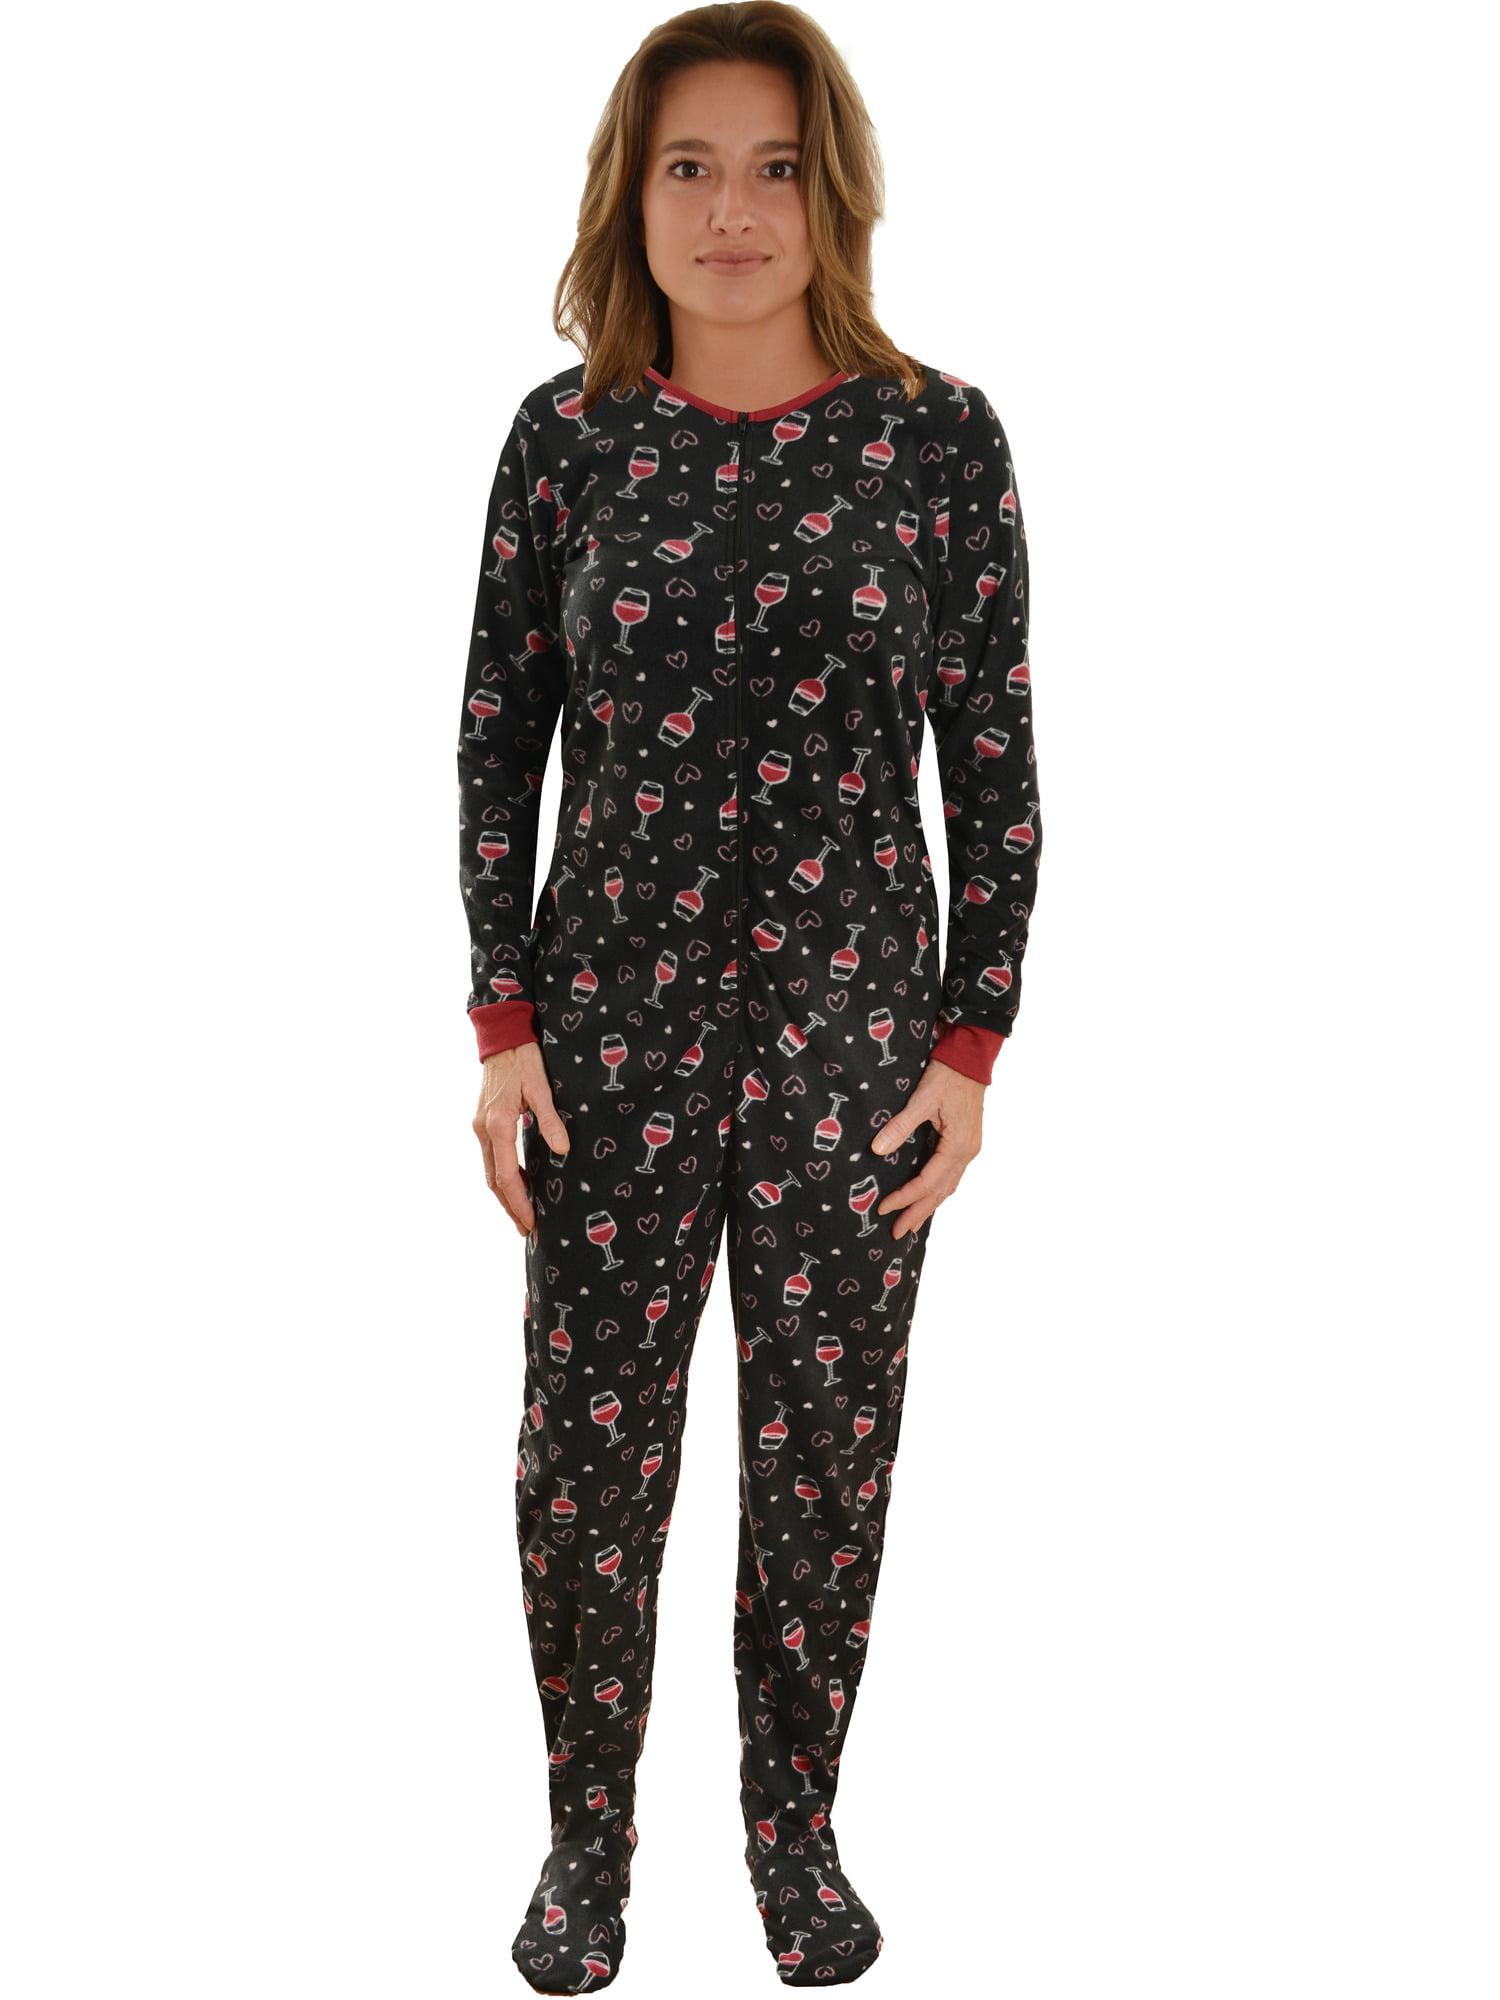 Int Intimate - Womens Black Footed Pajamas Wine Glass ...